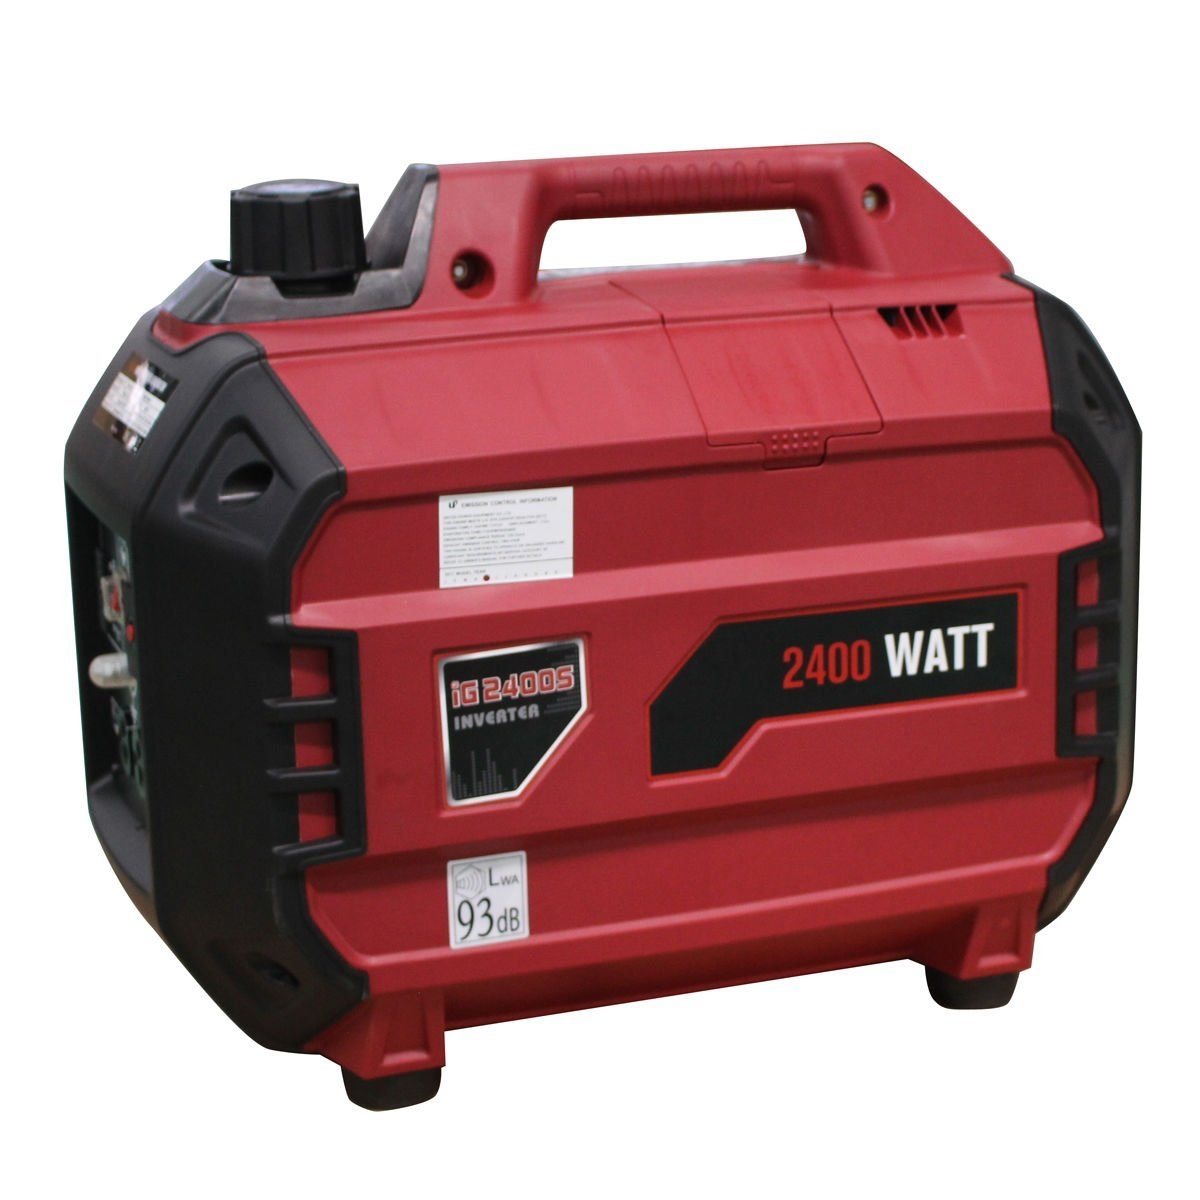 New MTN-G Portable 2400 Watt Inverter Gasoline Generator 4 Stroke 113cc Air Cooled EPA by MTN Gearsmith